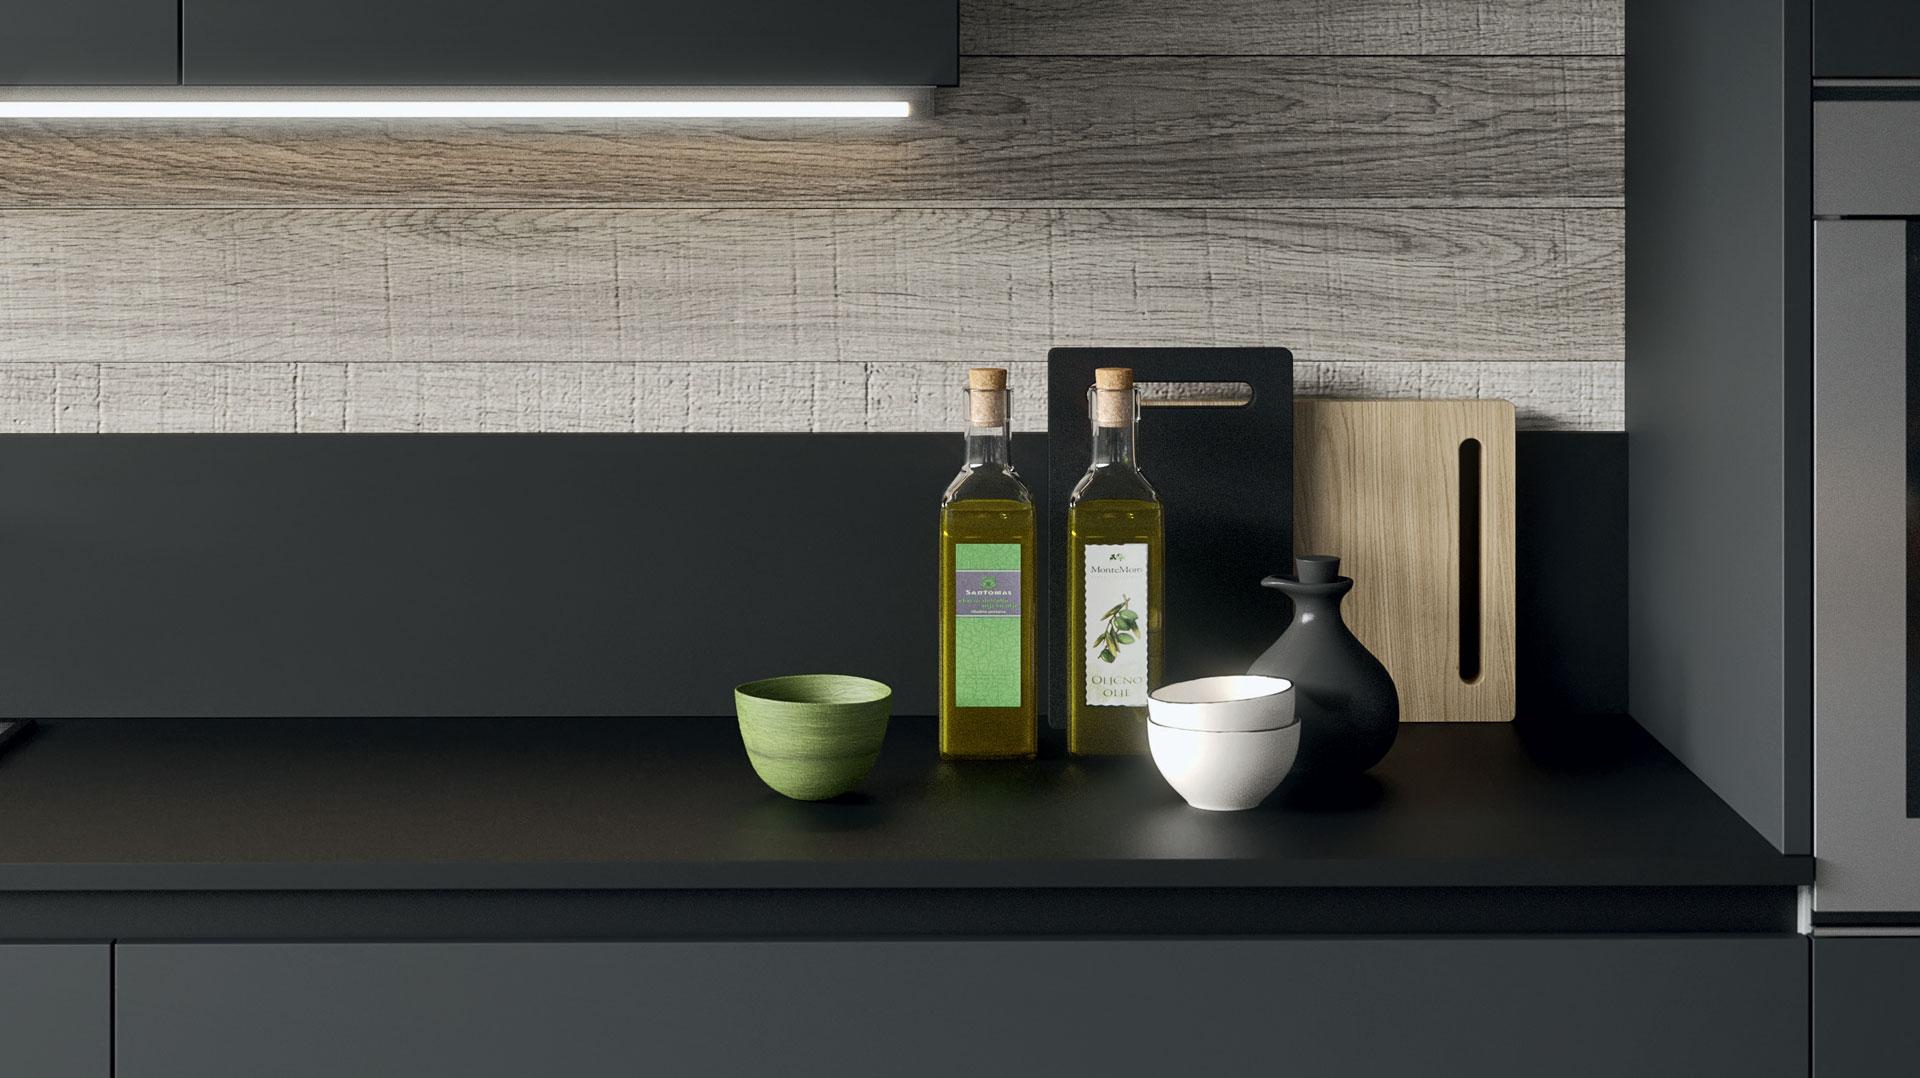 Cucine moderne de sign tecnologia ed eleganza gicinque - Spessore top cucina ...